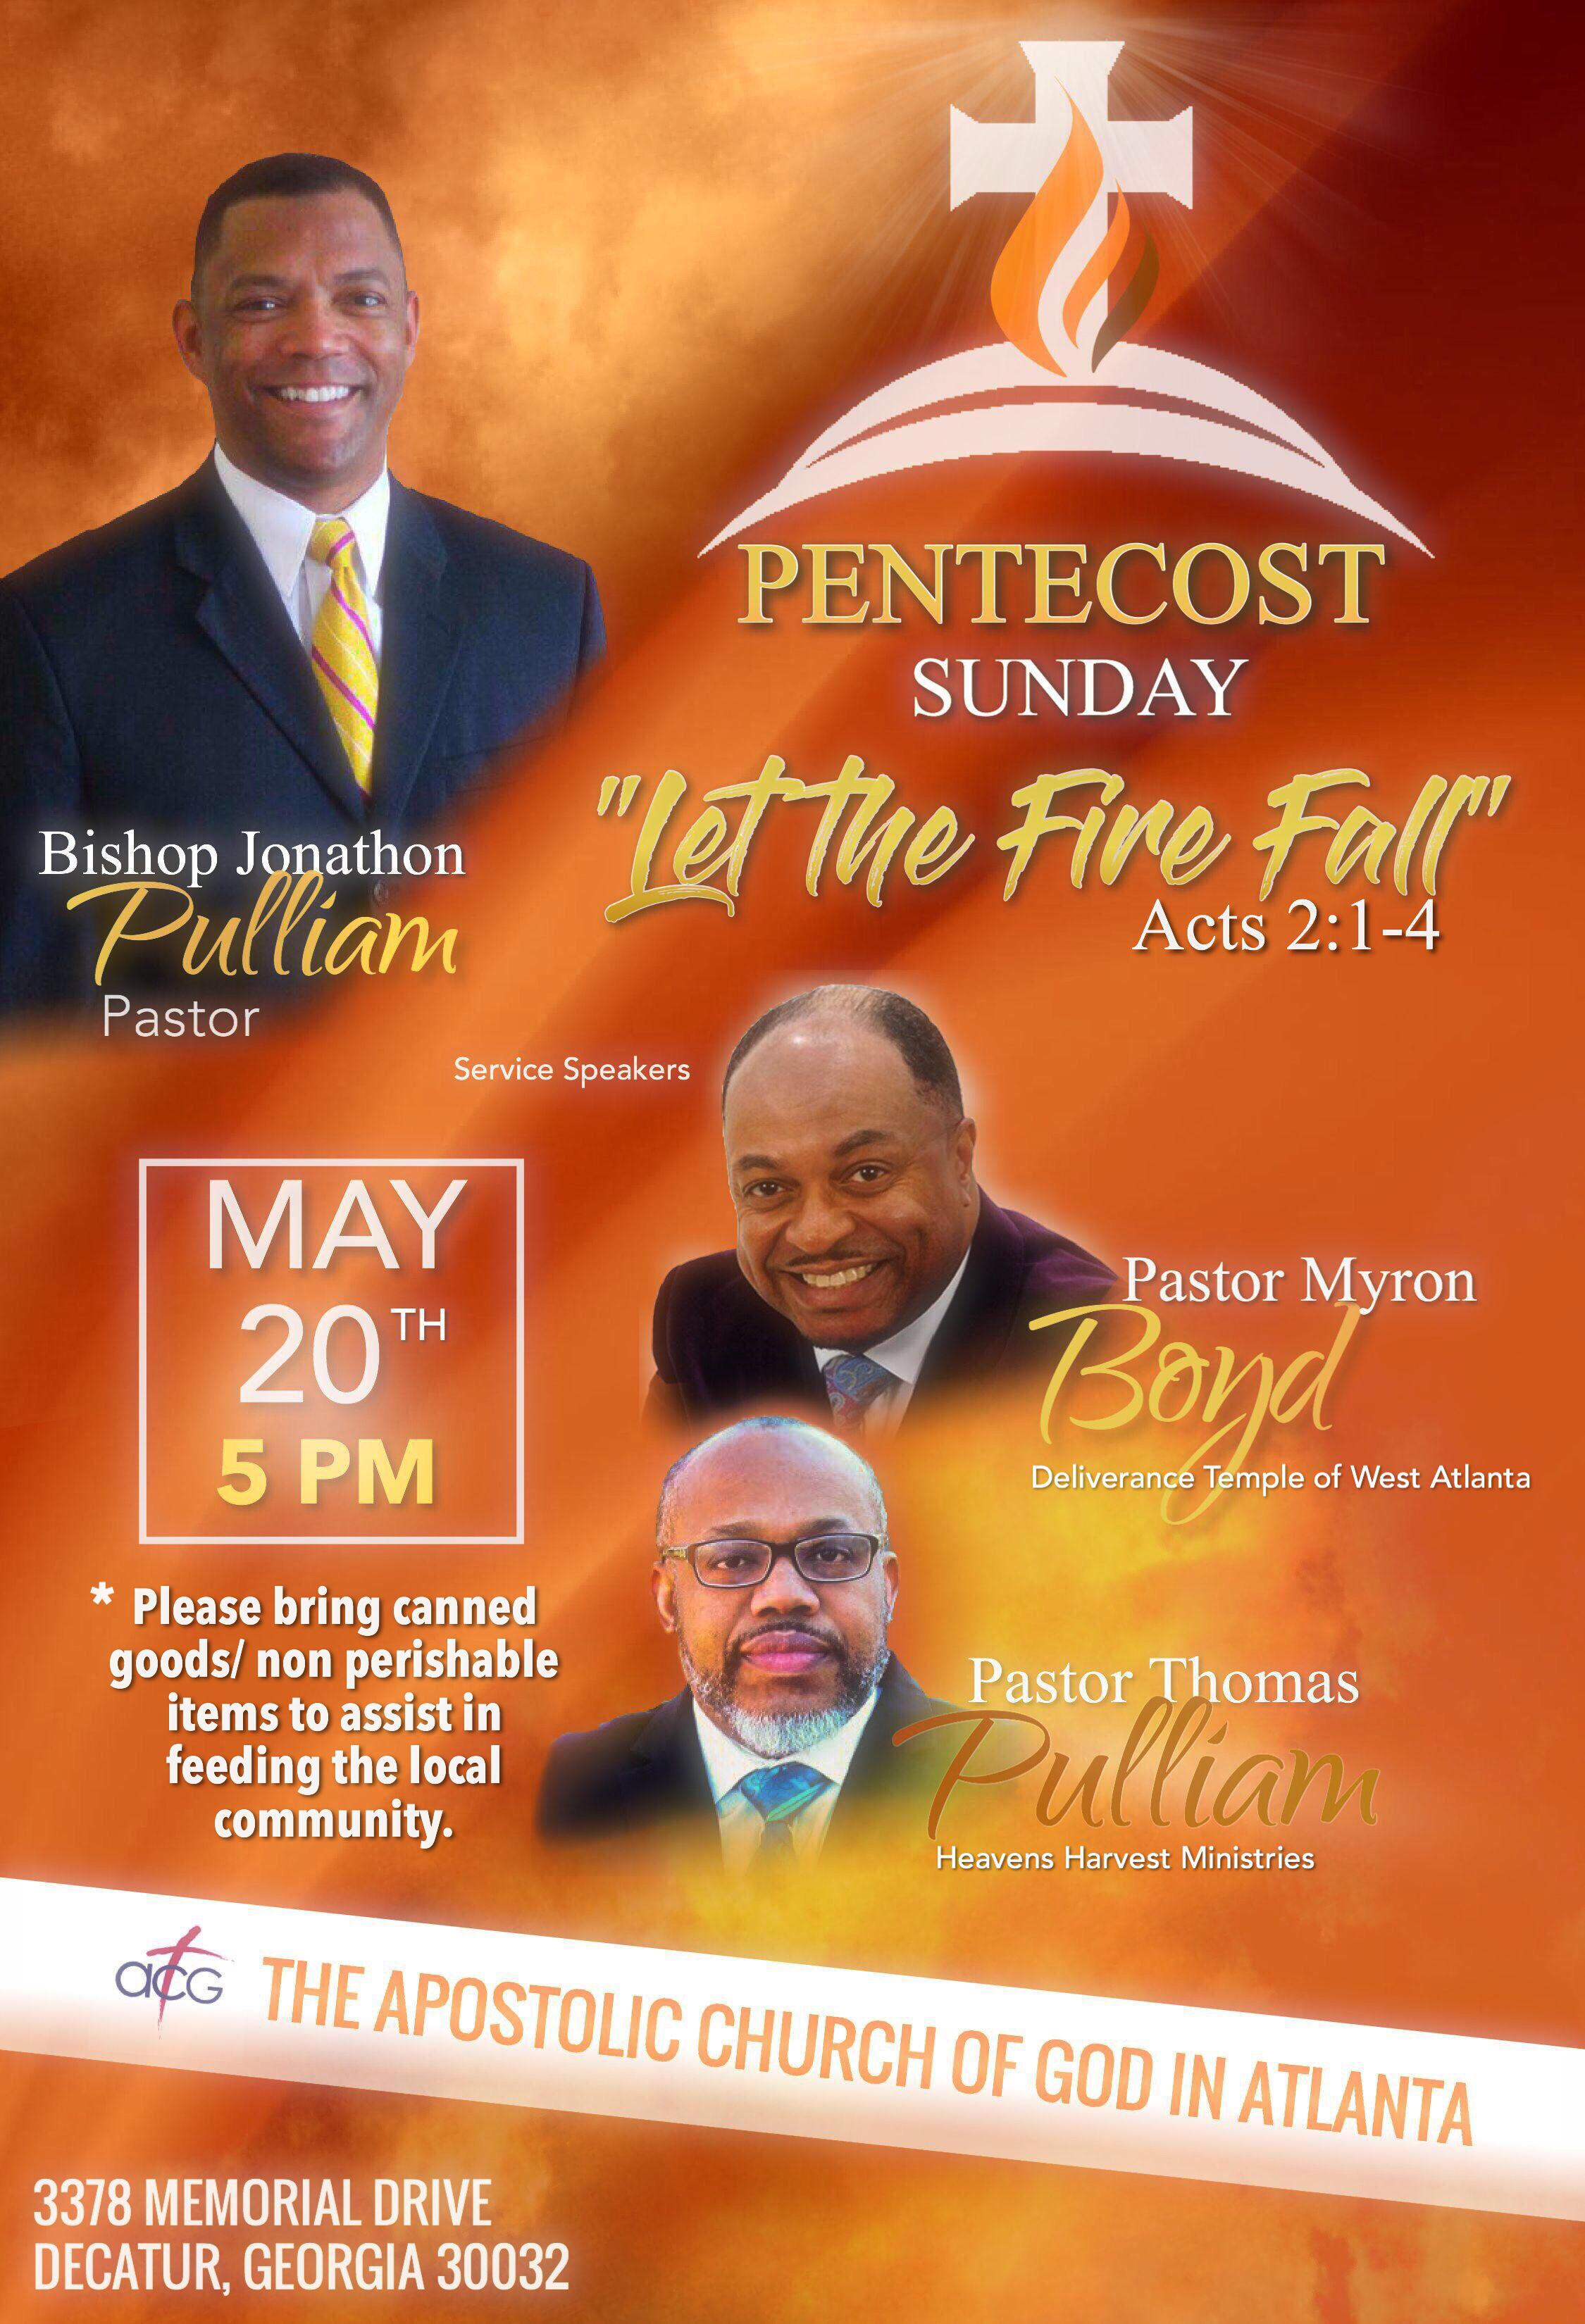 let the fire fall pentecost sunday celebration